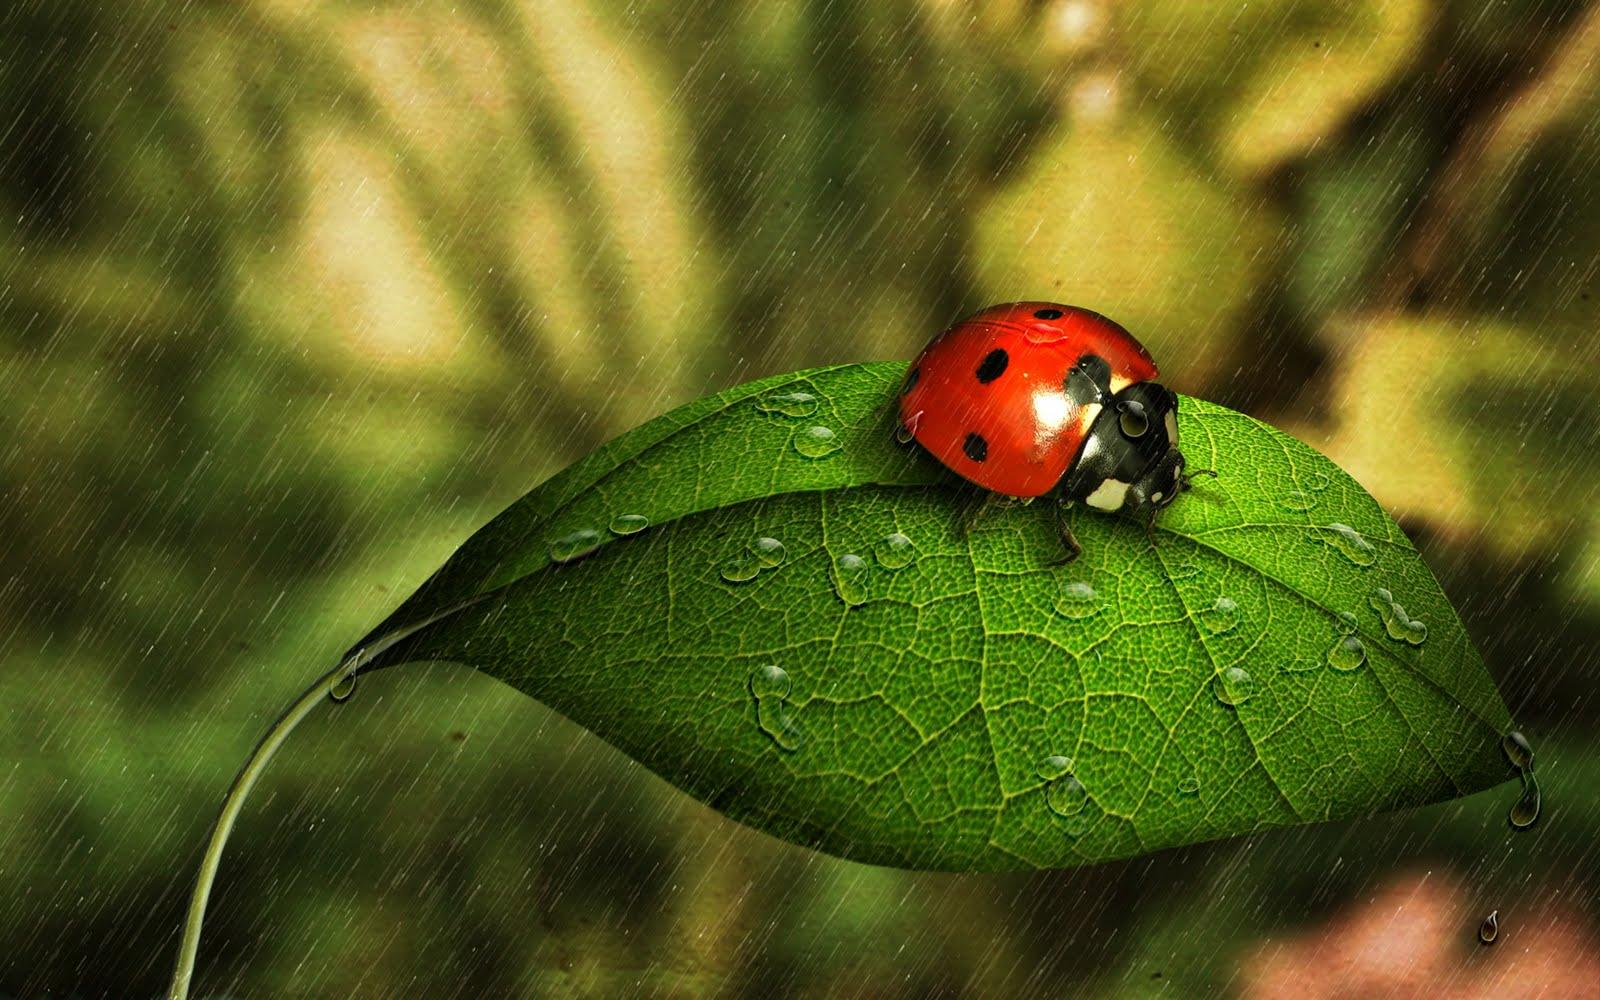 Wallpaper Download Cute Lovers Ladybug Green Leaf Nature Hd Love Wallpaper Love